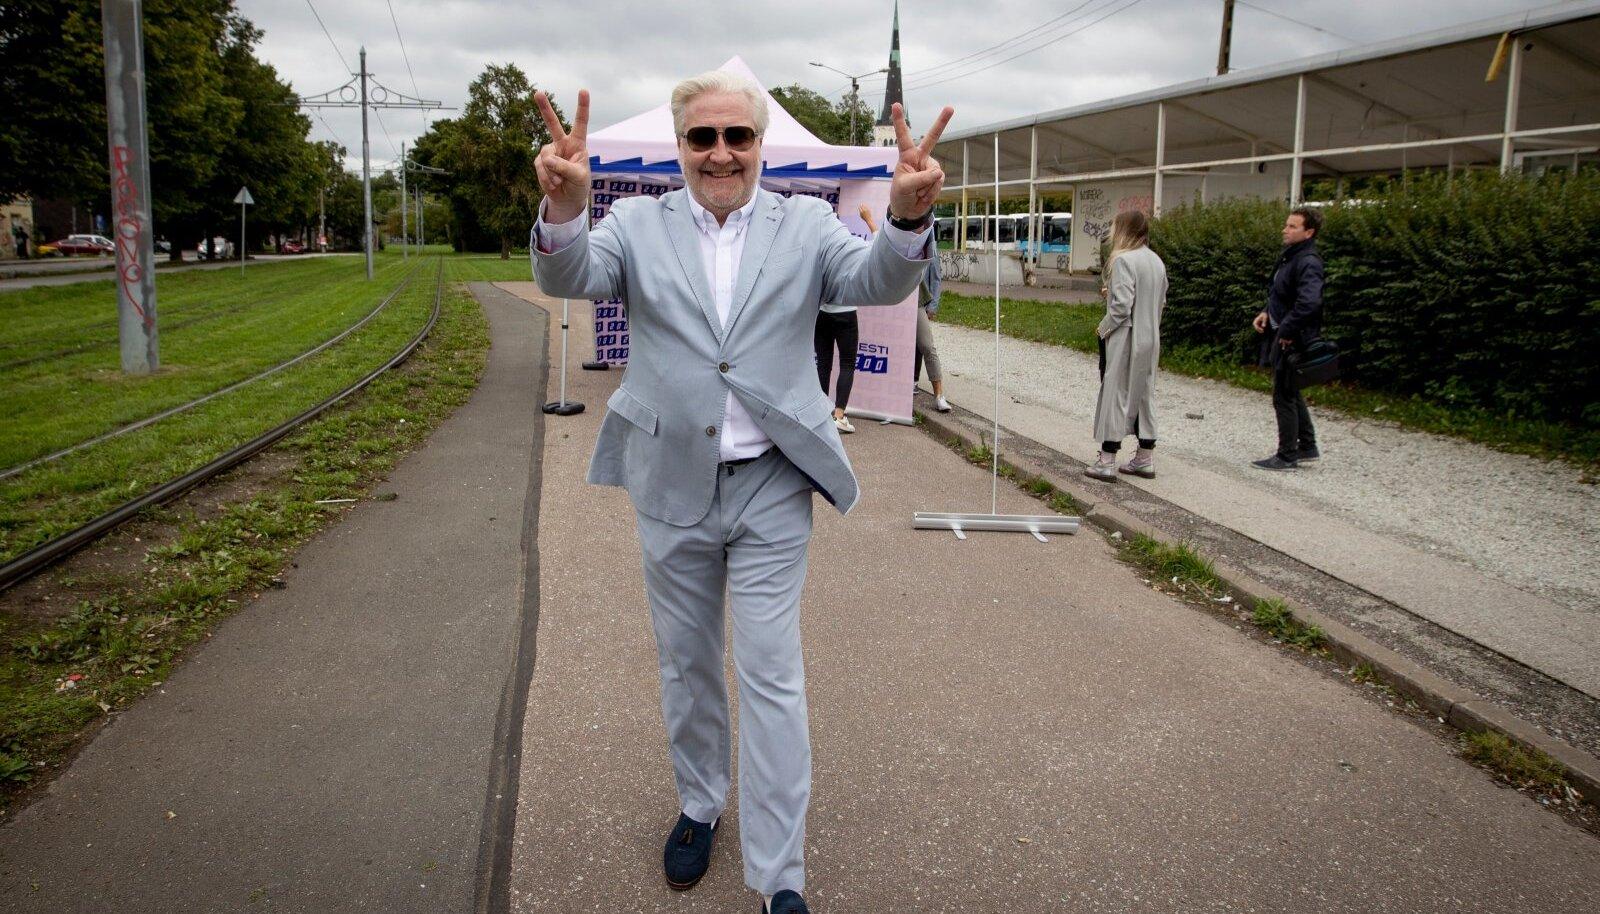 Eesti 200 Tallinna linnapeakandidaat Marek Reinaas